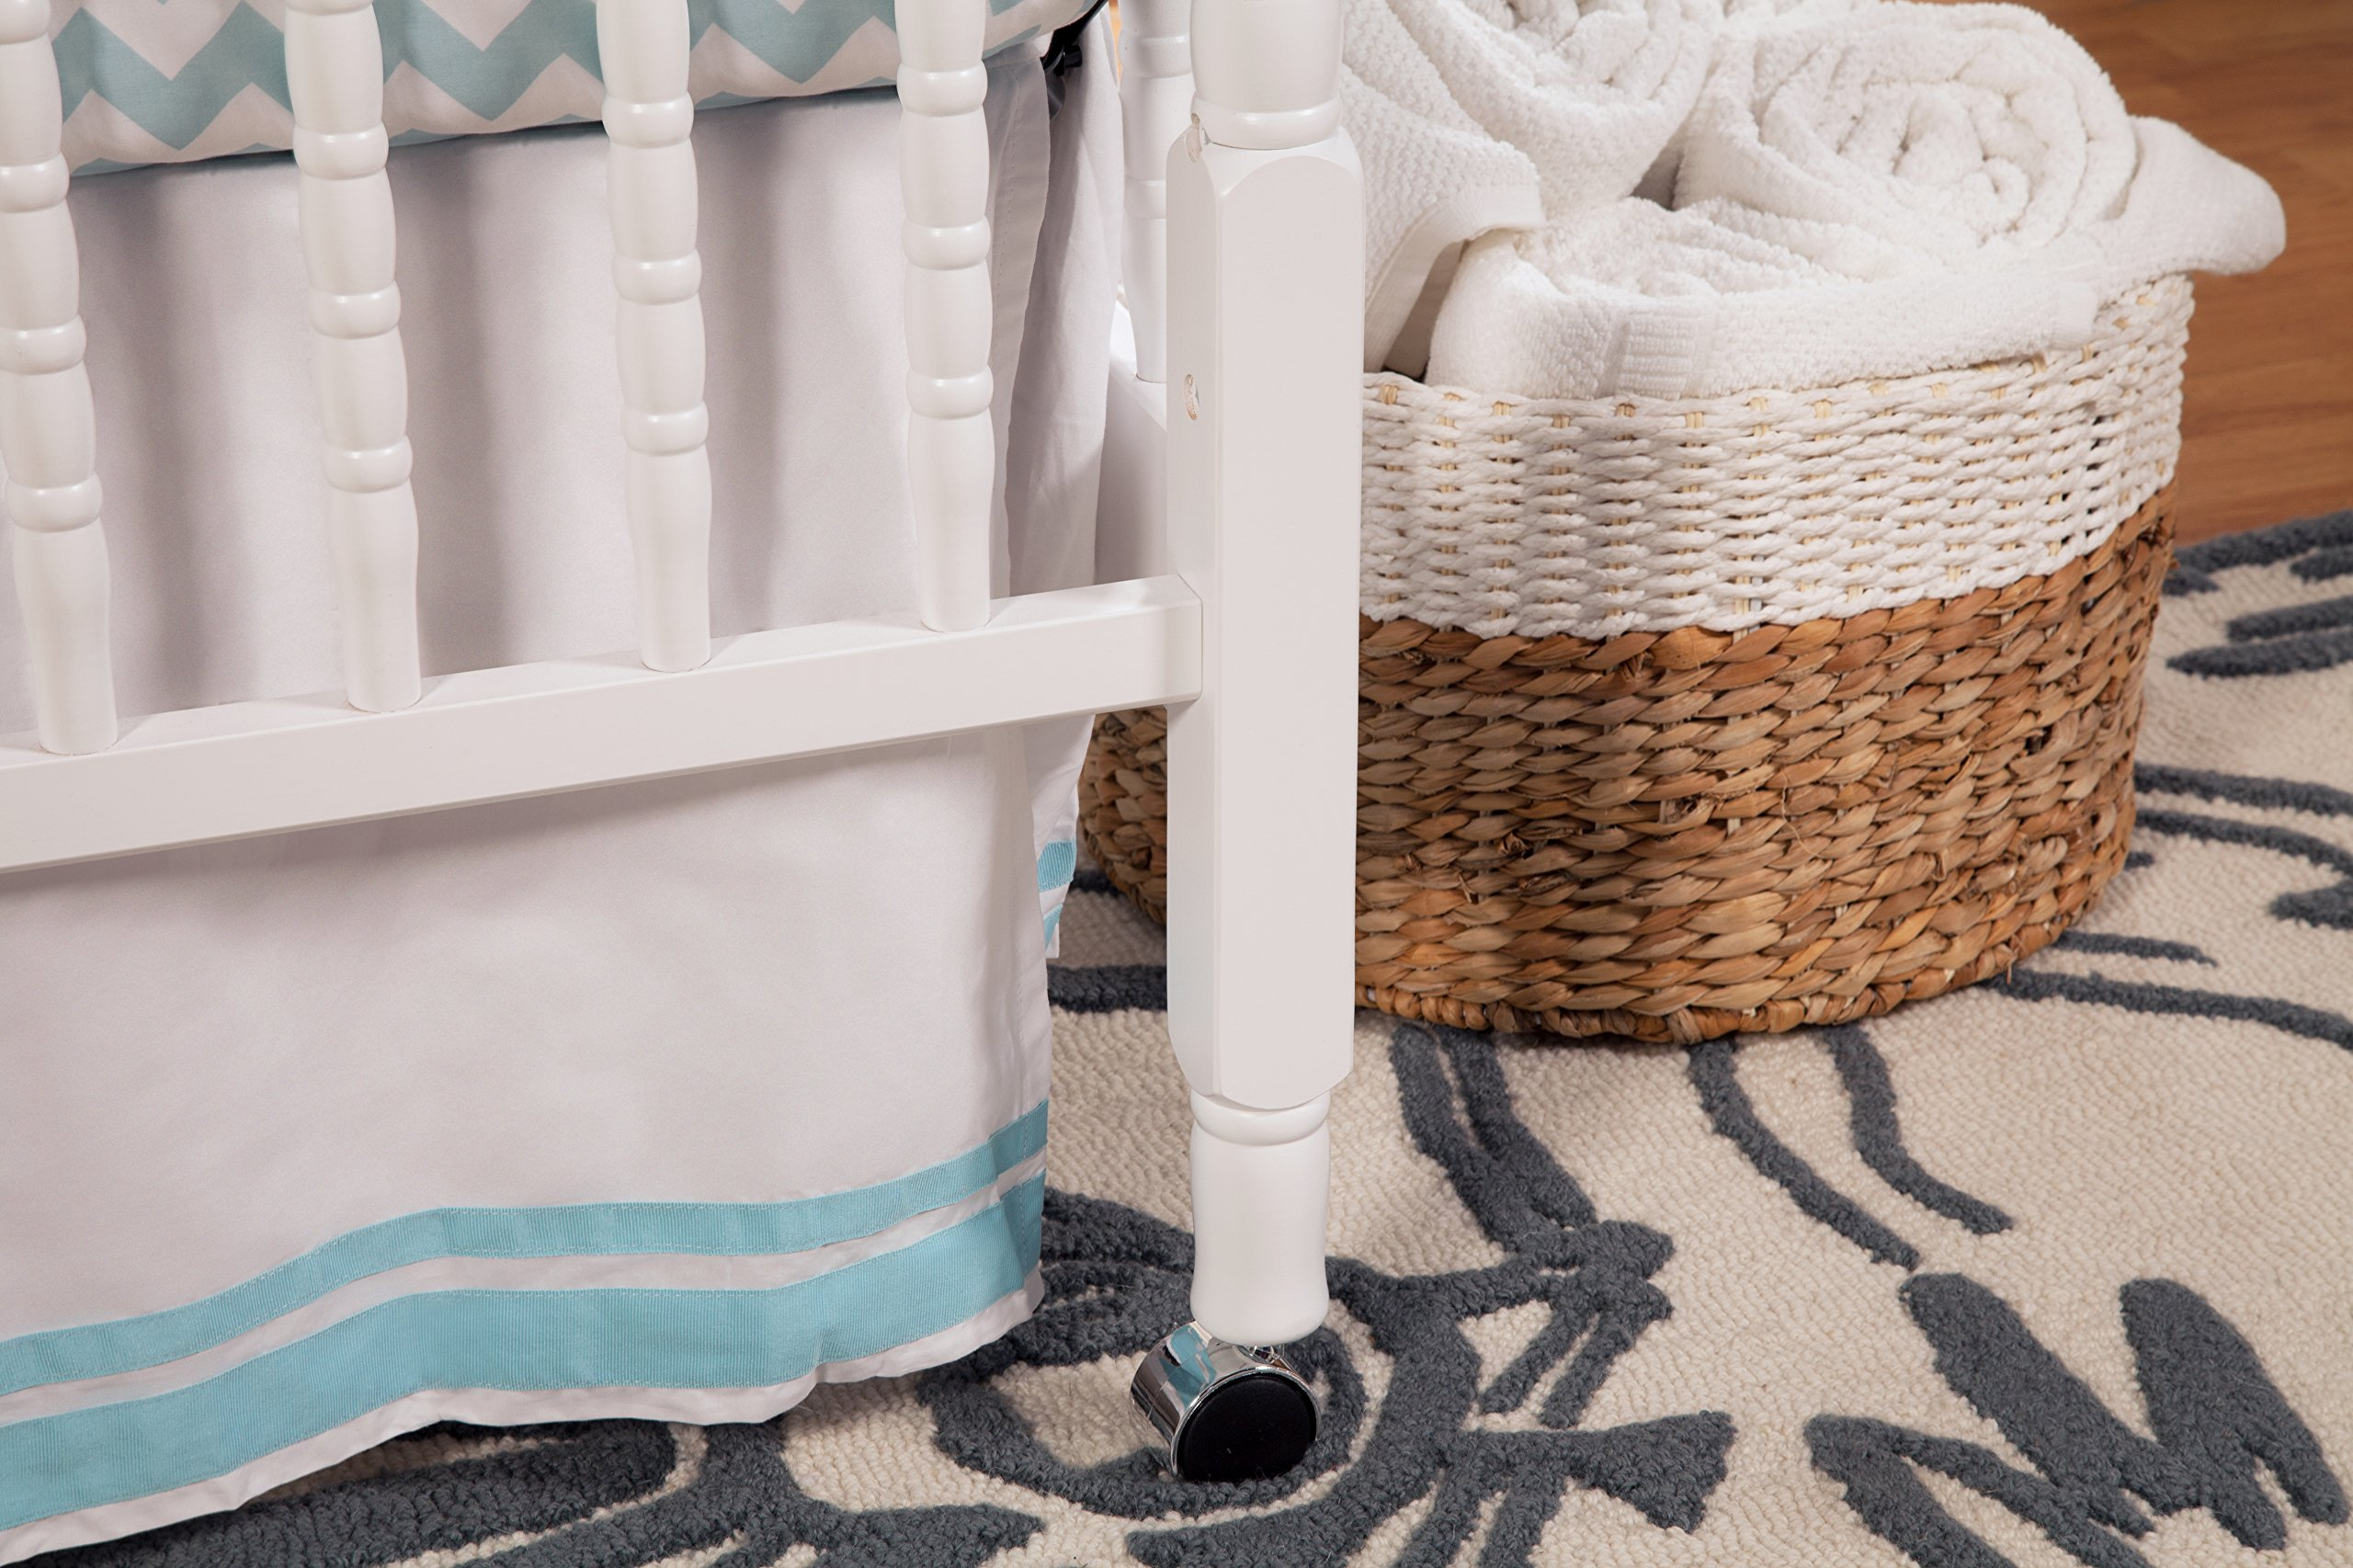 DaVinci Jenny Lind Stationary Crib, White by DaVinci (Image #6)